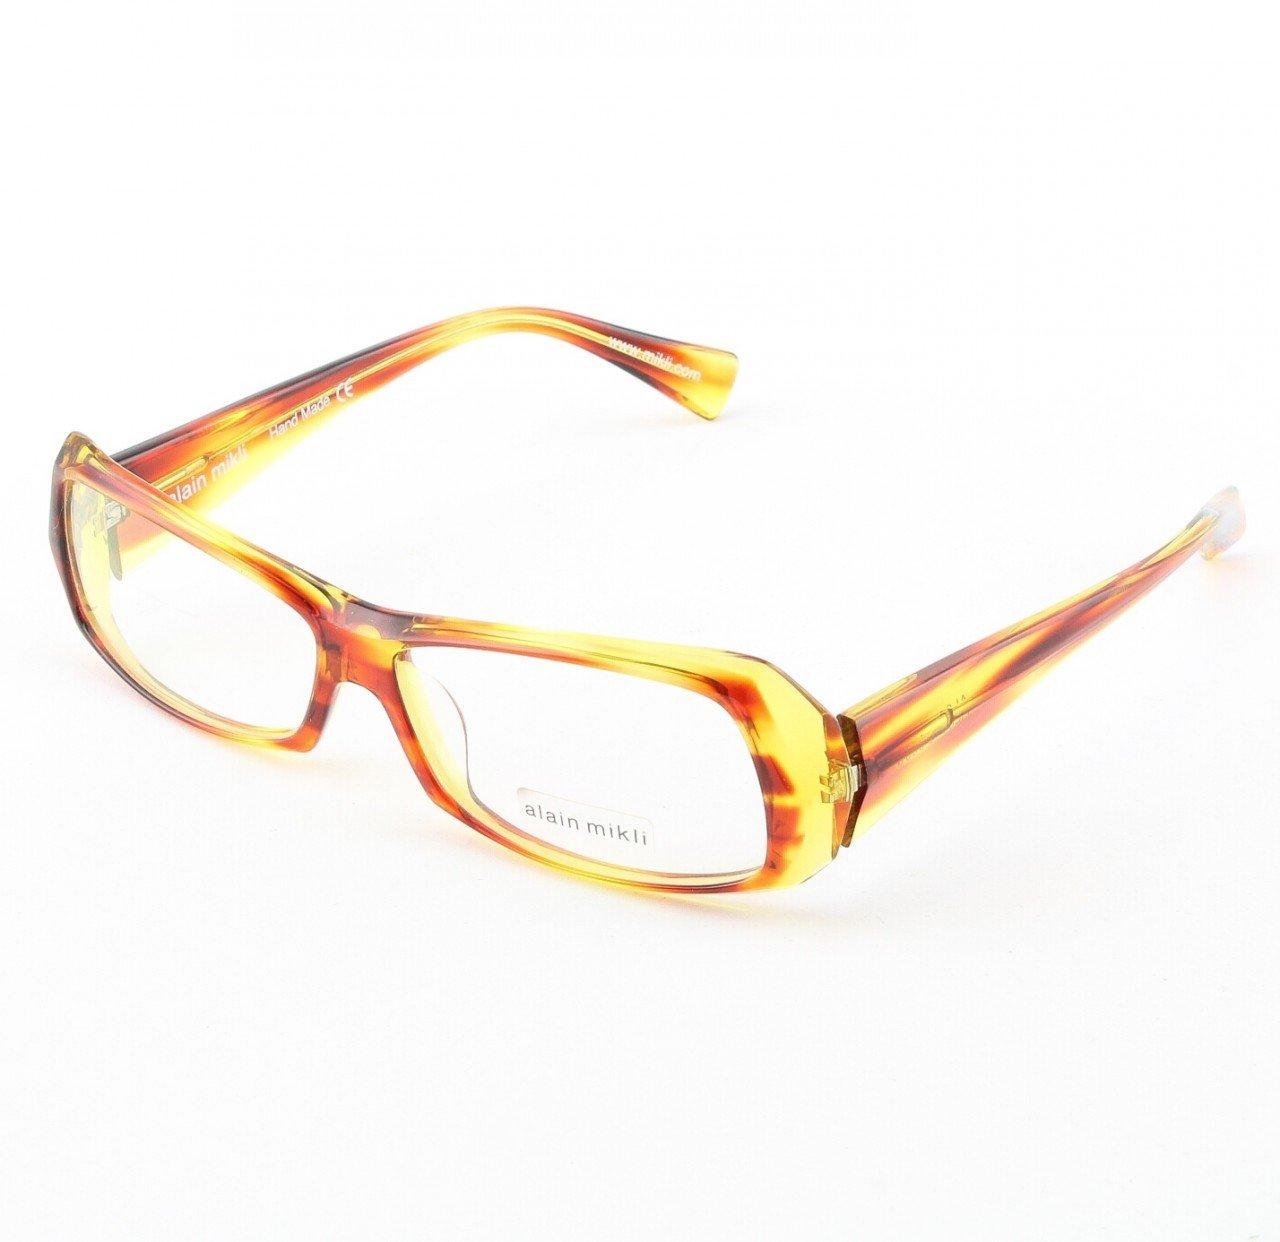 Alain Mikli Eyeglasses AL0945 Col. 3 Mottled Burnt Orange and Yellow